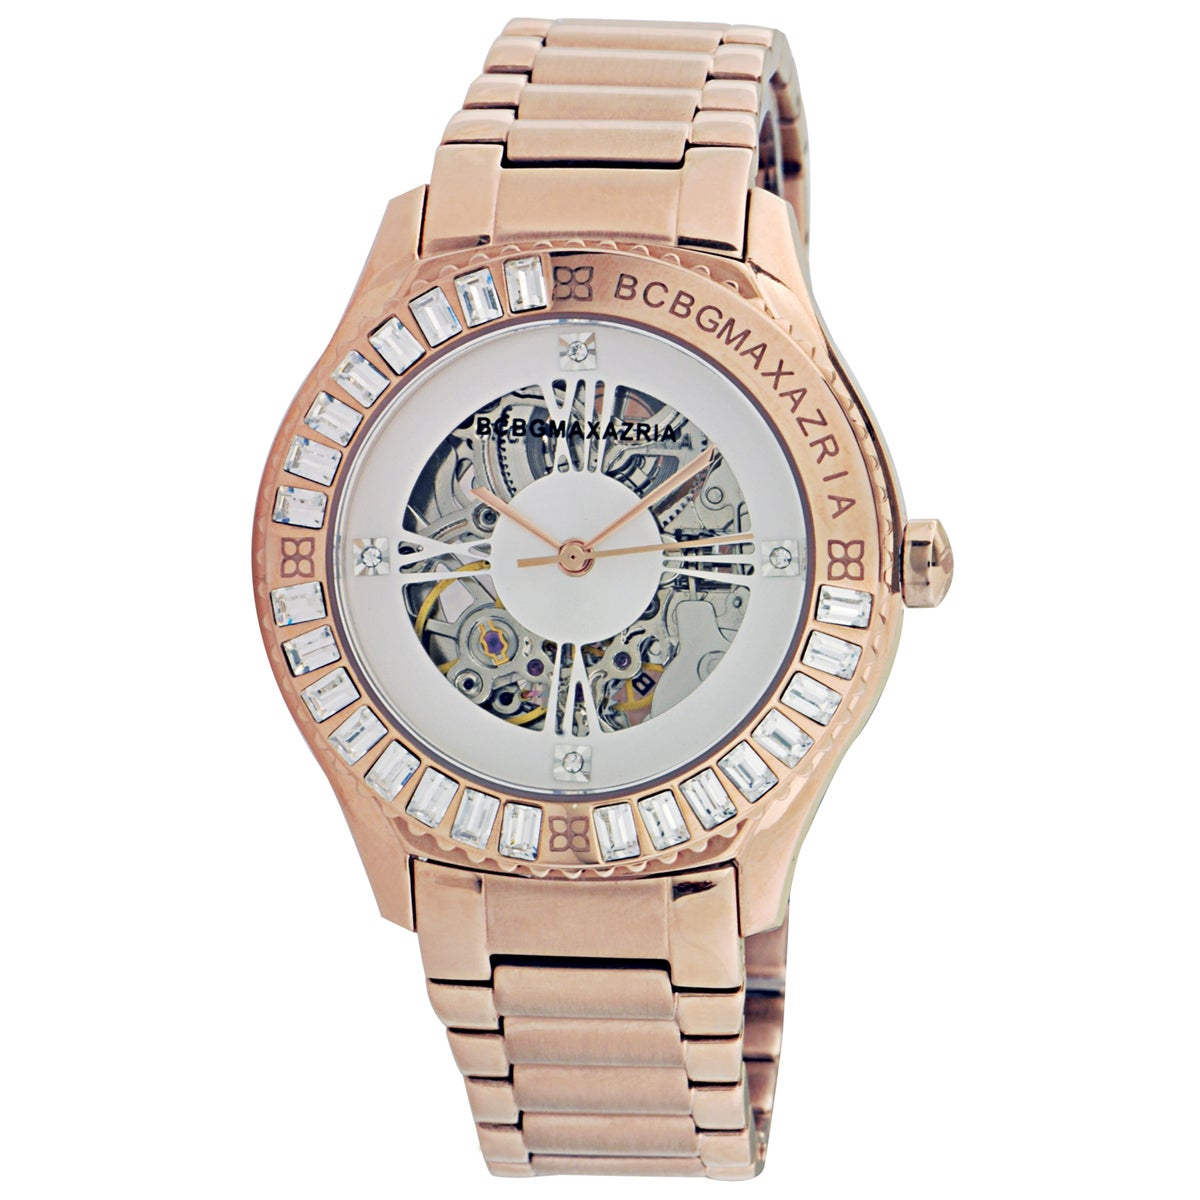 BCBG_Maxazria Women's 'VIP Glam Auto' Skeleton Automatic Watch